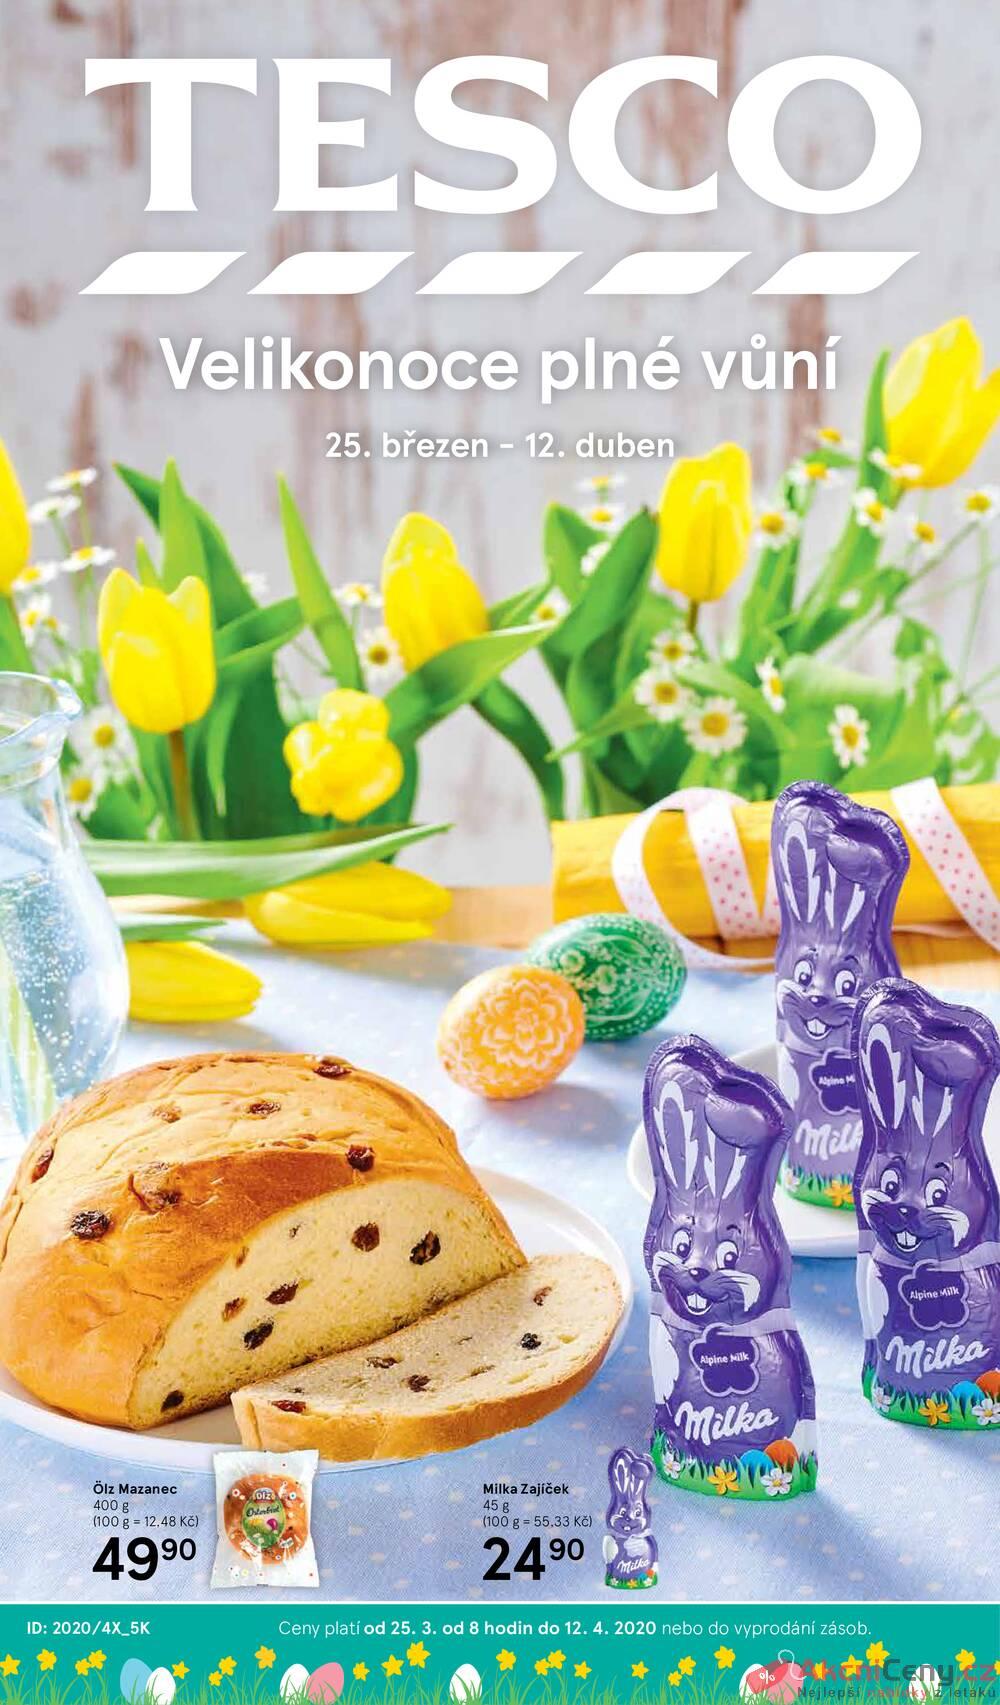 Tesco malé hypermarkety katalog Velikonoce od 25.3. do 12.4.2020